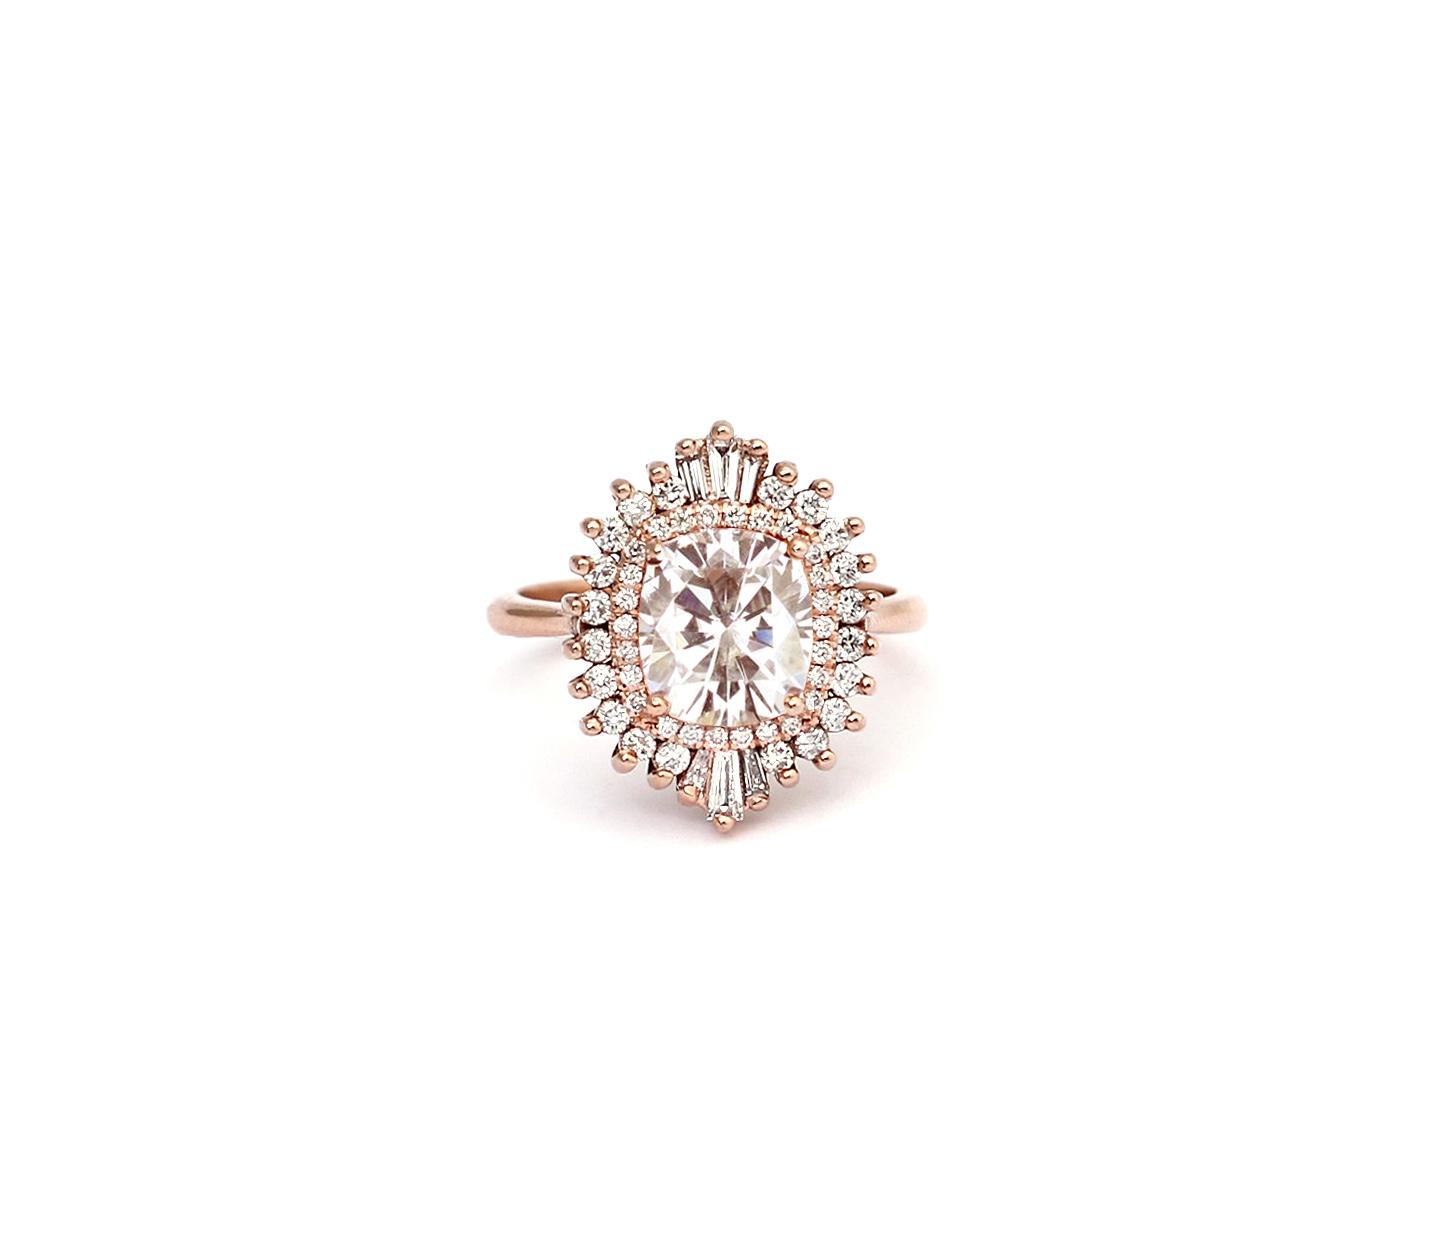 heidi gibson Rockefeller engagement ring cushion cut starburst diamonds rose gold